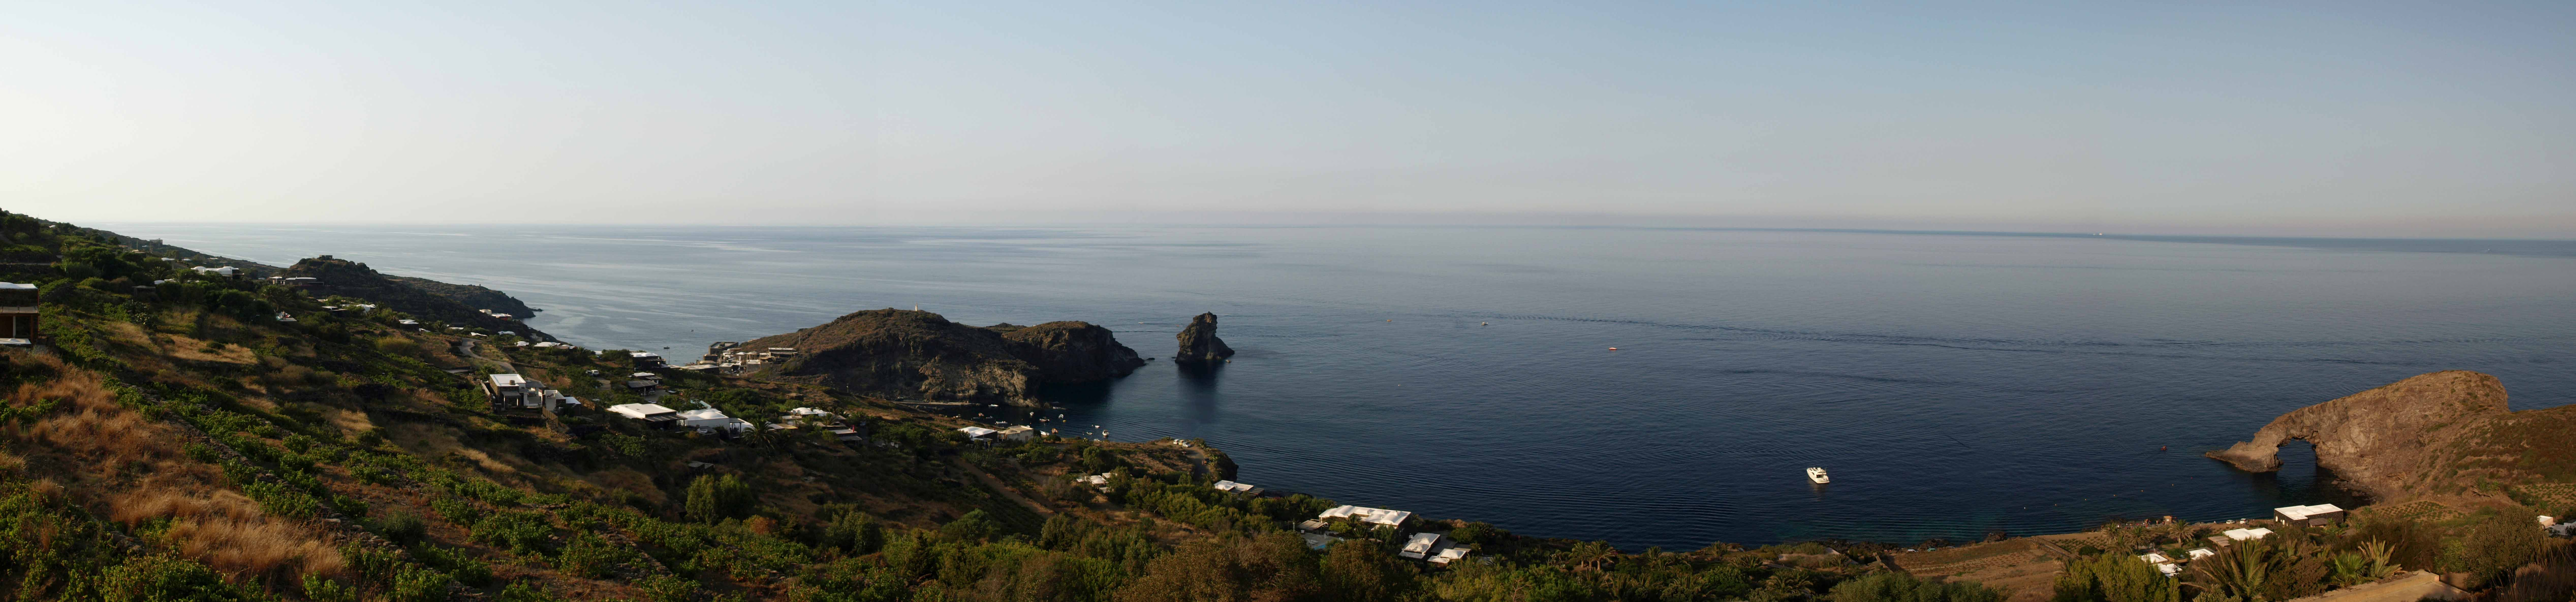 Panorama Cala Levante Pantelleria